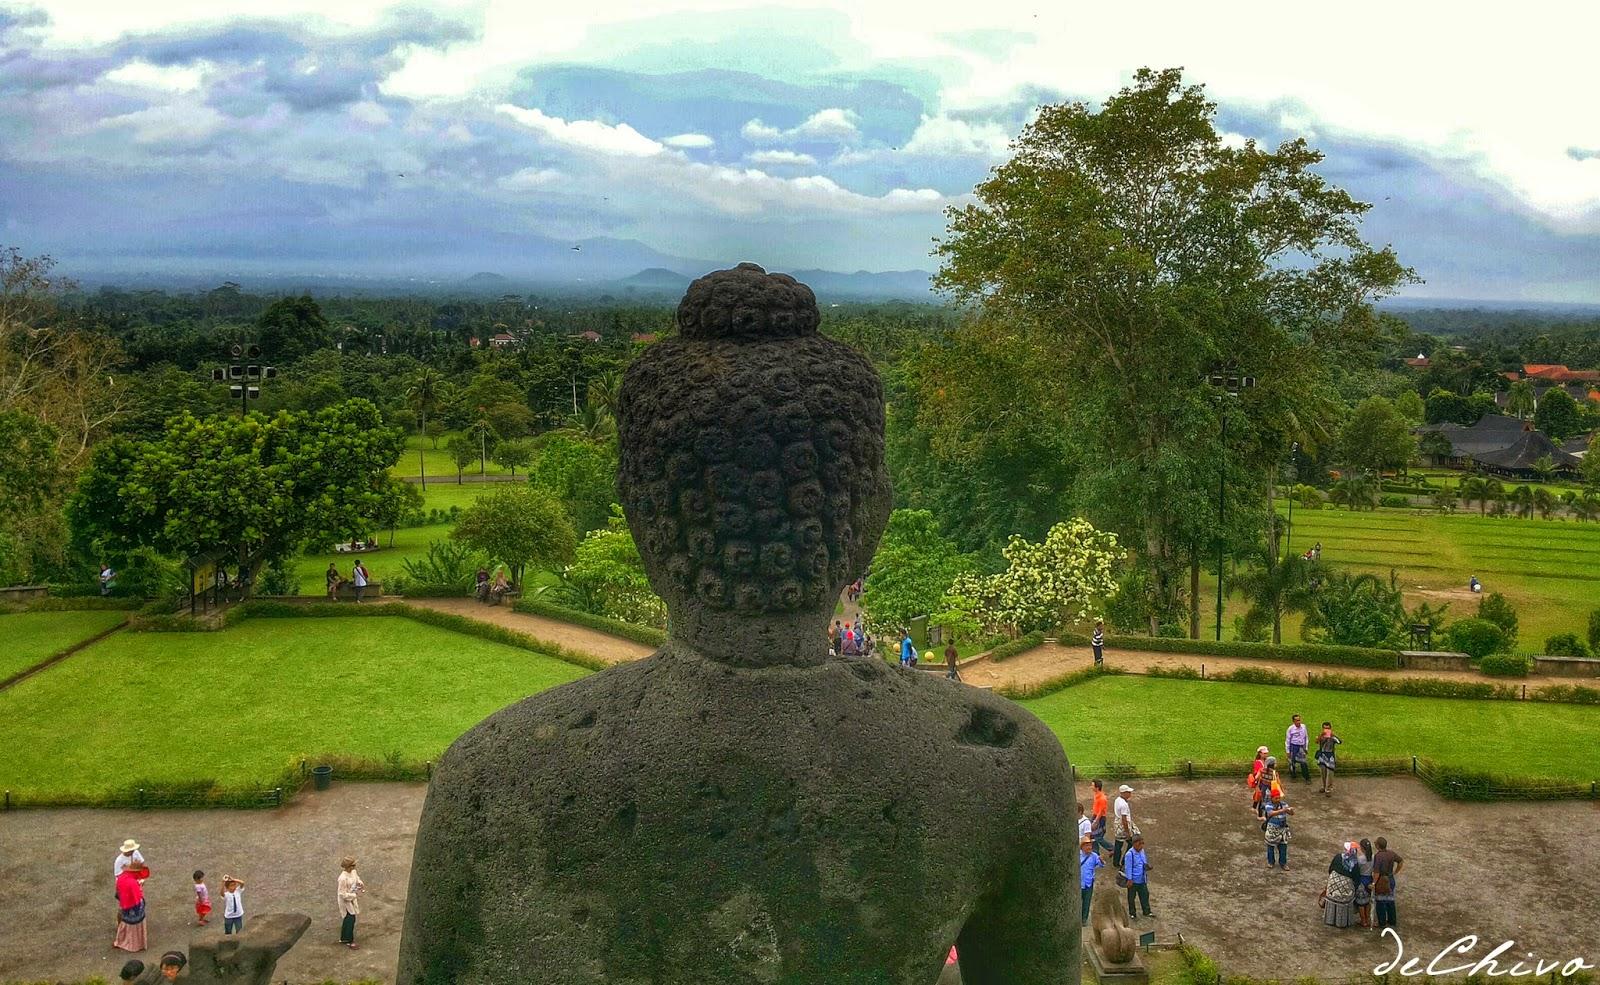 Patung Budha dan Pemandangan Alam di Candi Borobudur